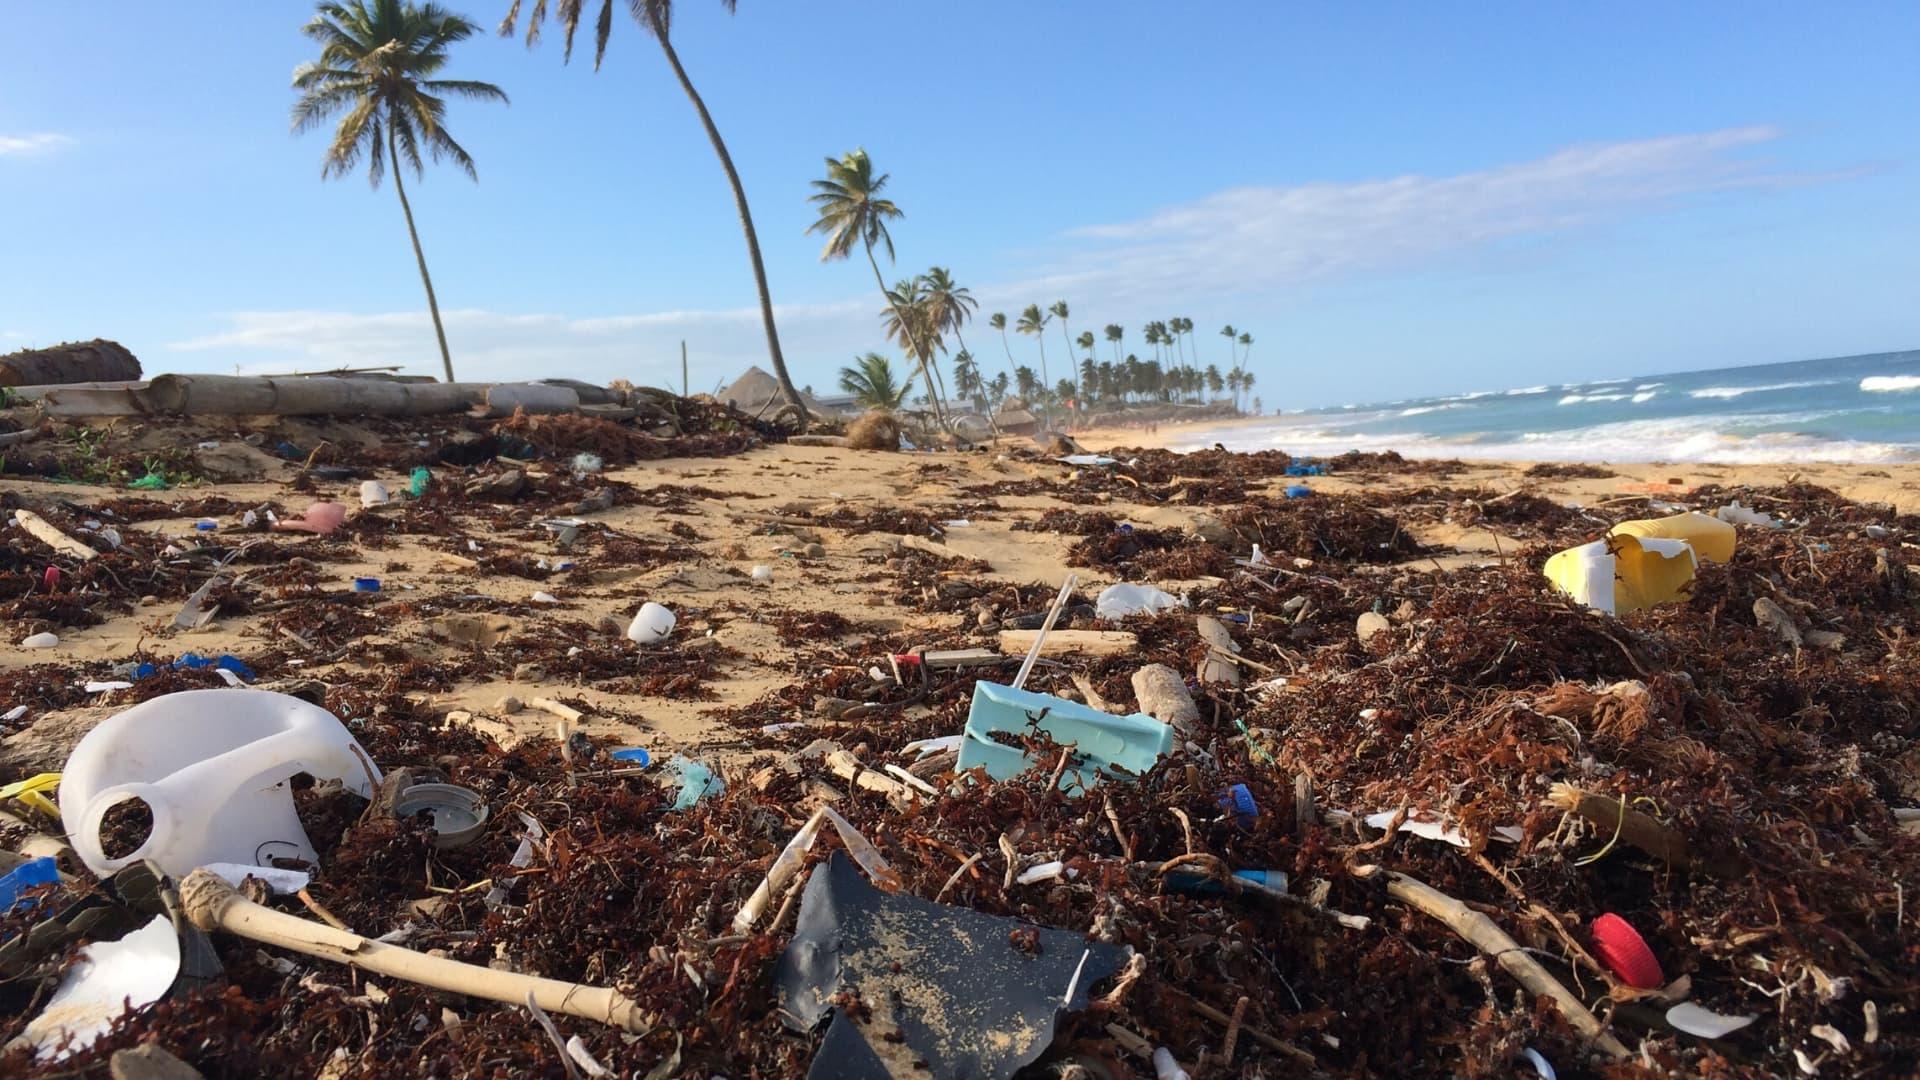 Abu Dhabi Will Ban Single-Use Plastic By 2021